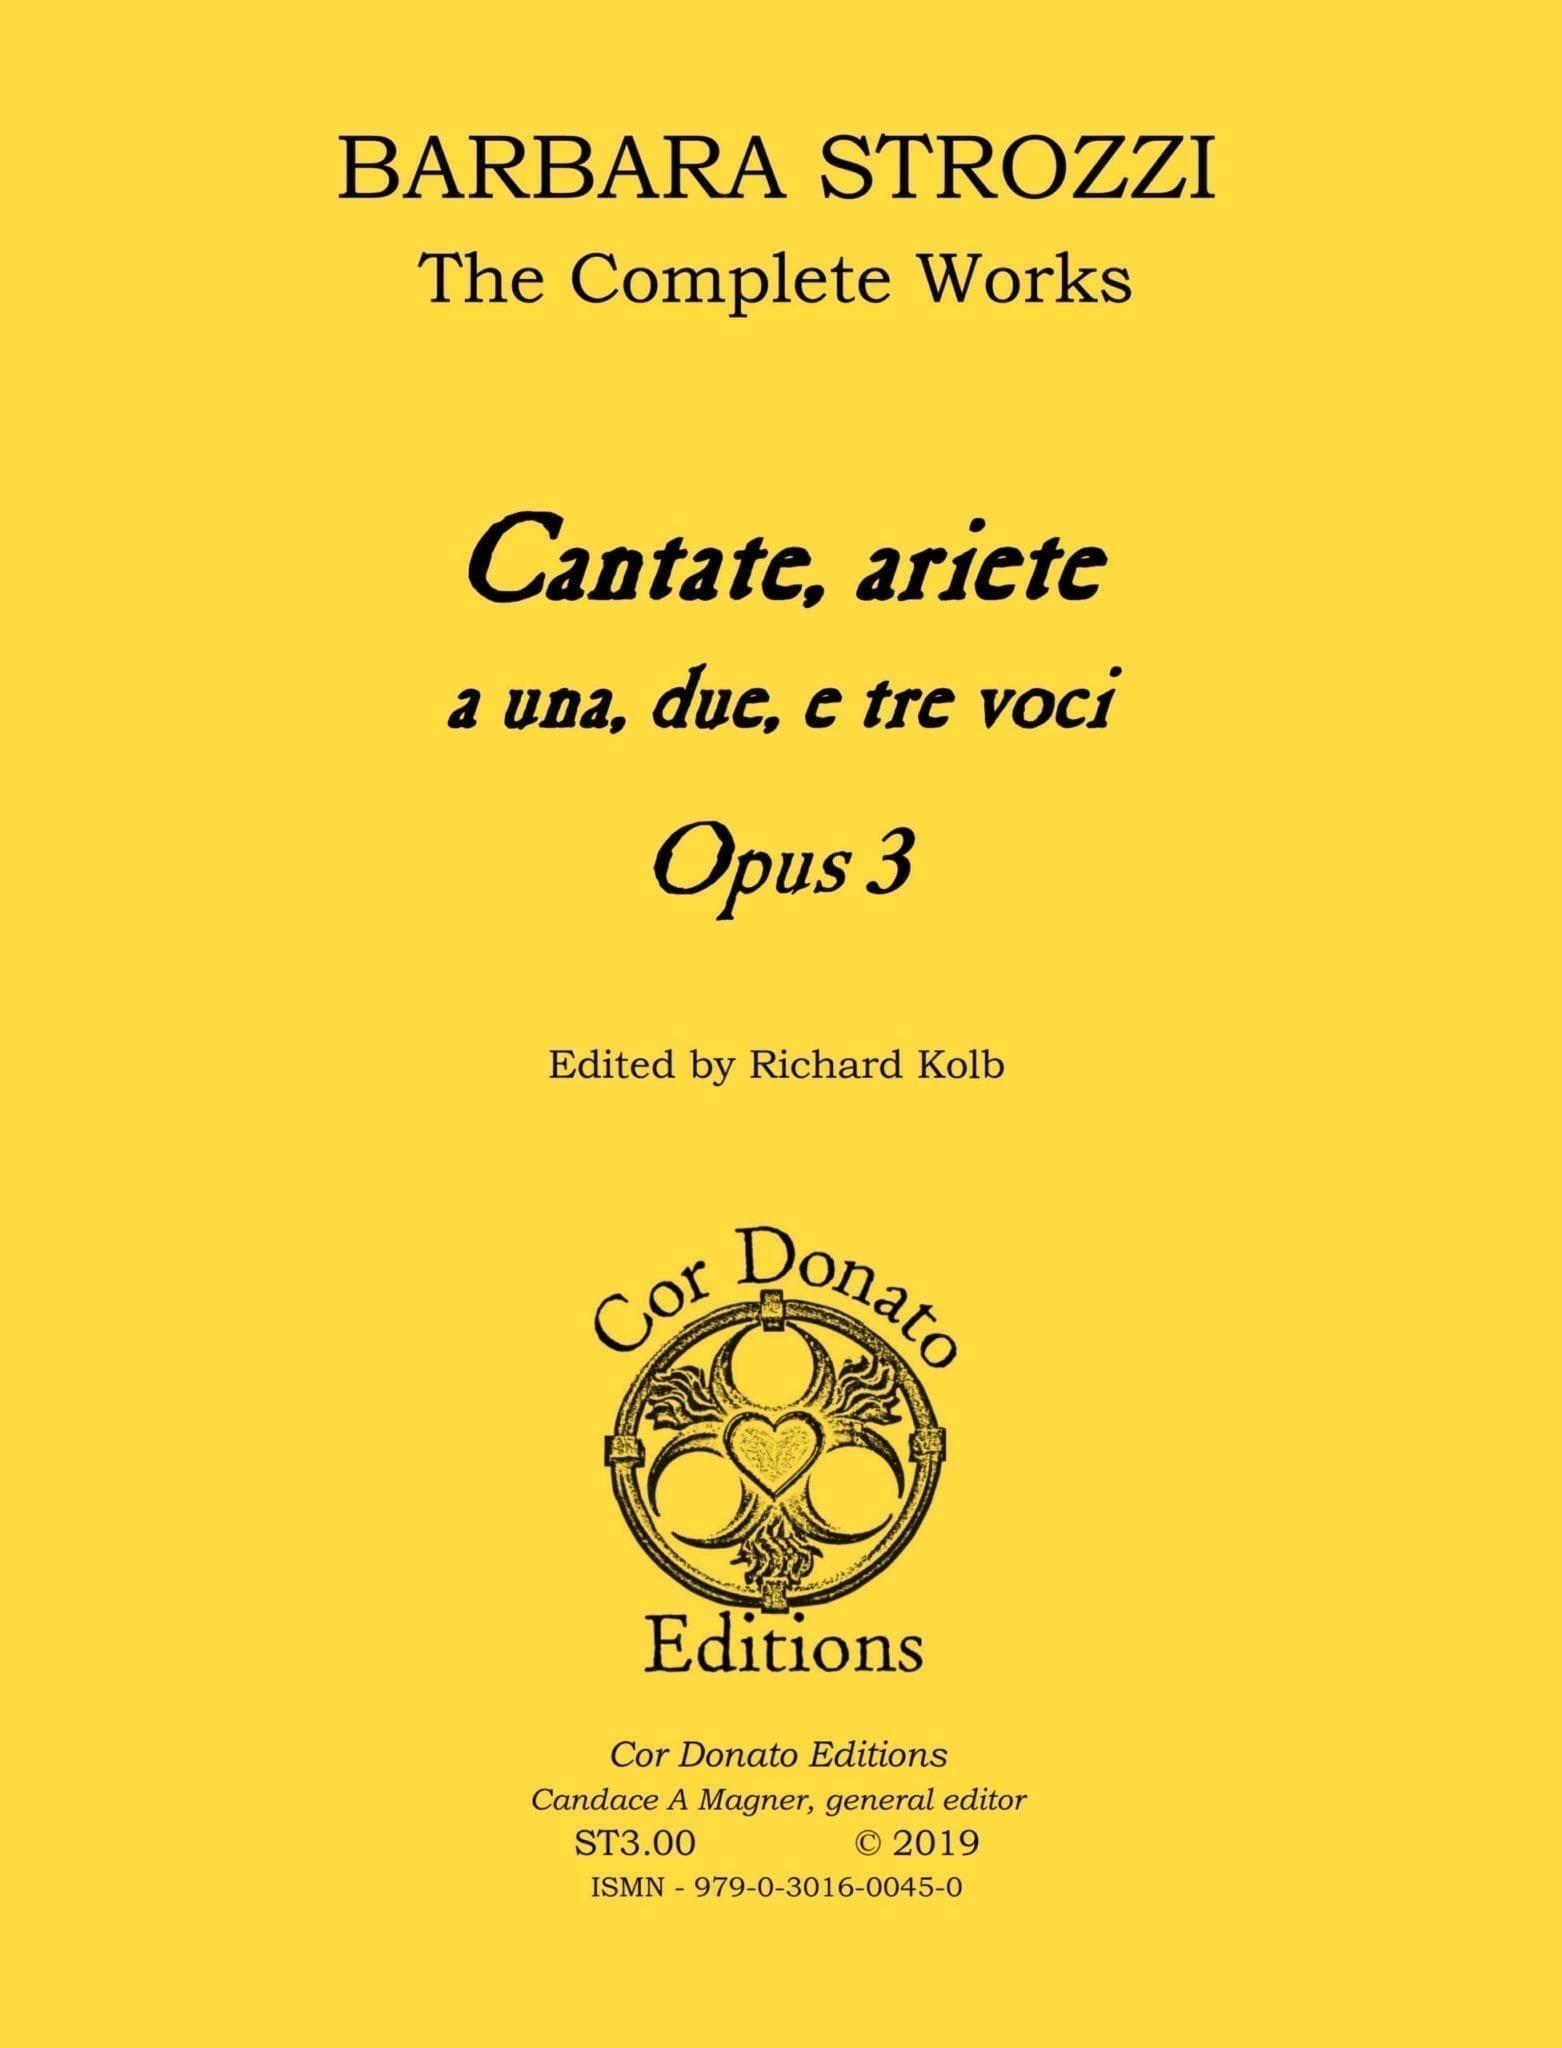 Barbara Strozzi, the Complete Works, Opus 1, Cantate, ariete a una, due, e tre voci